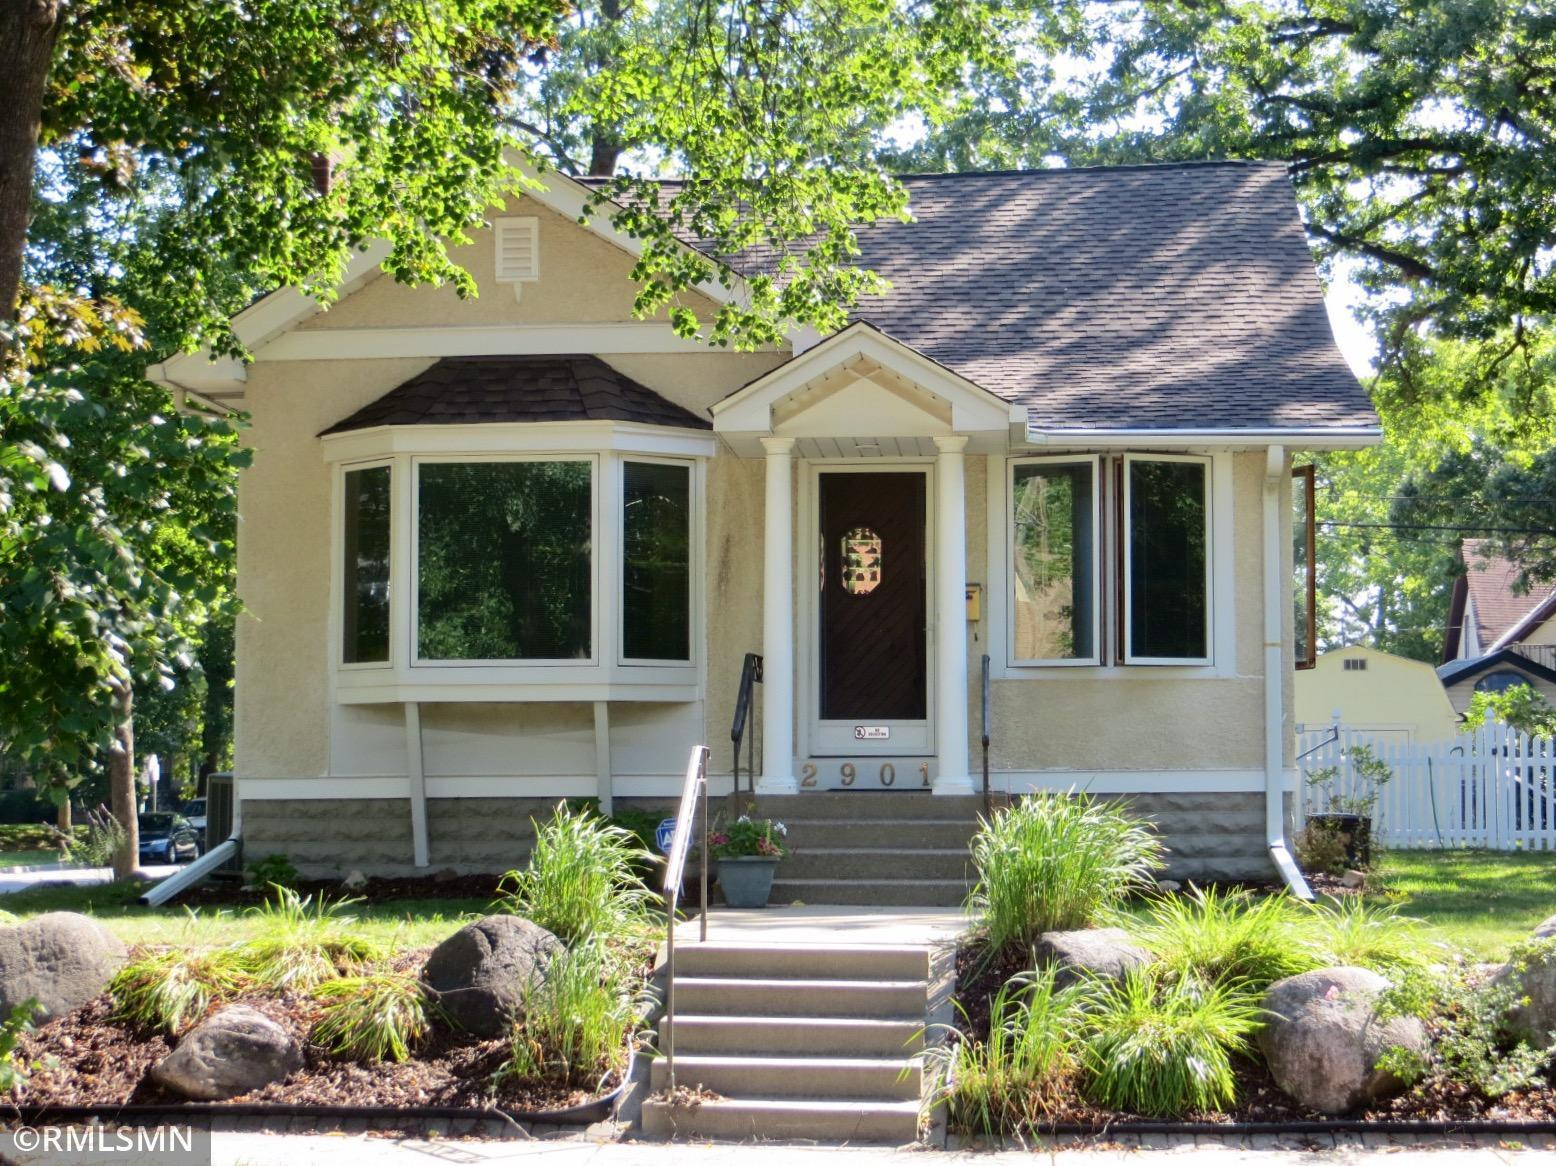 2901 40th Avenue Property Photo